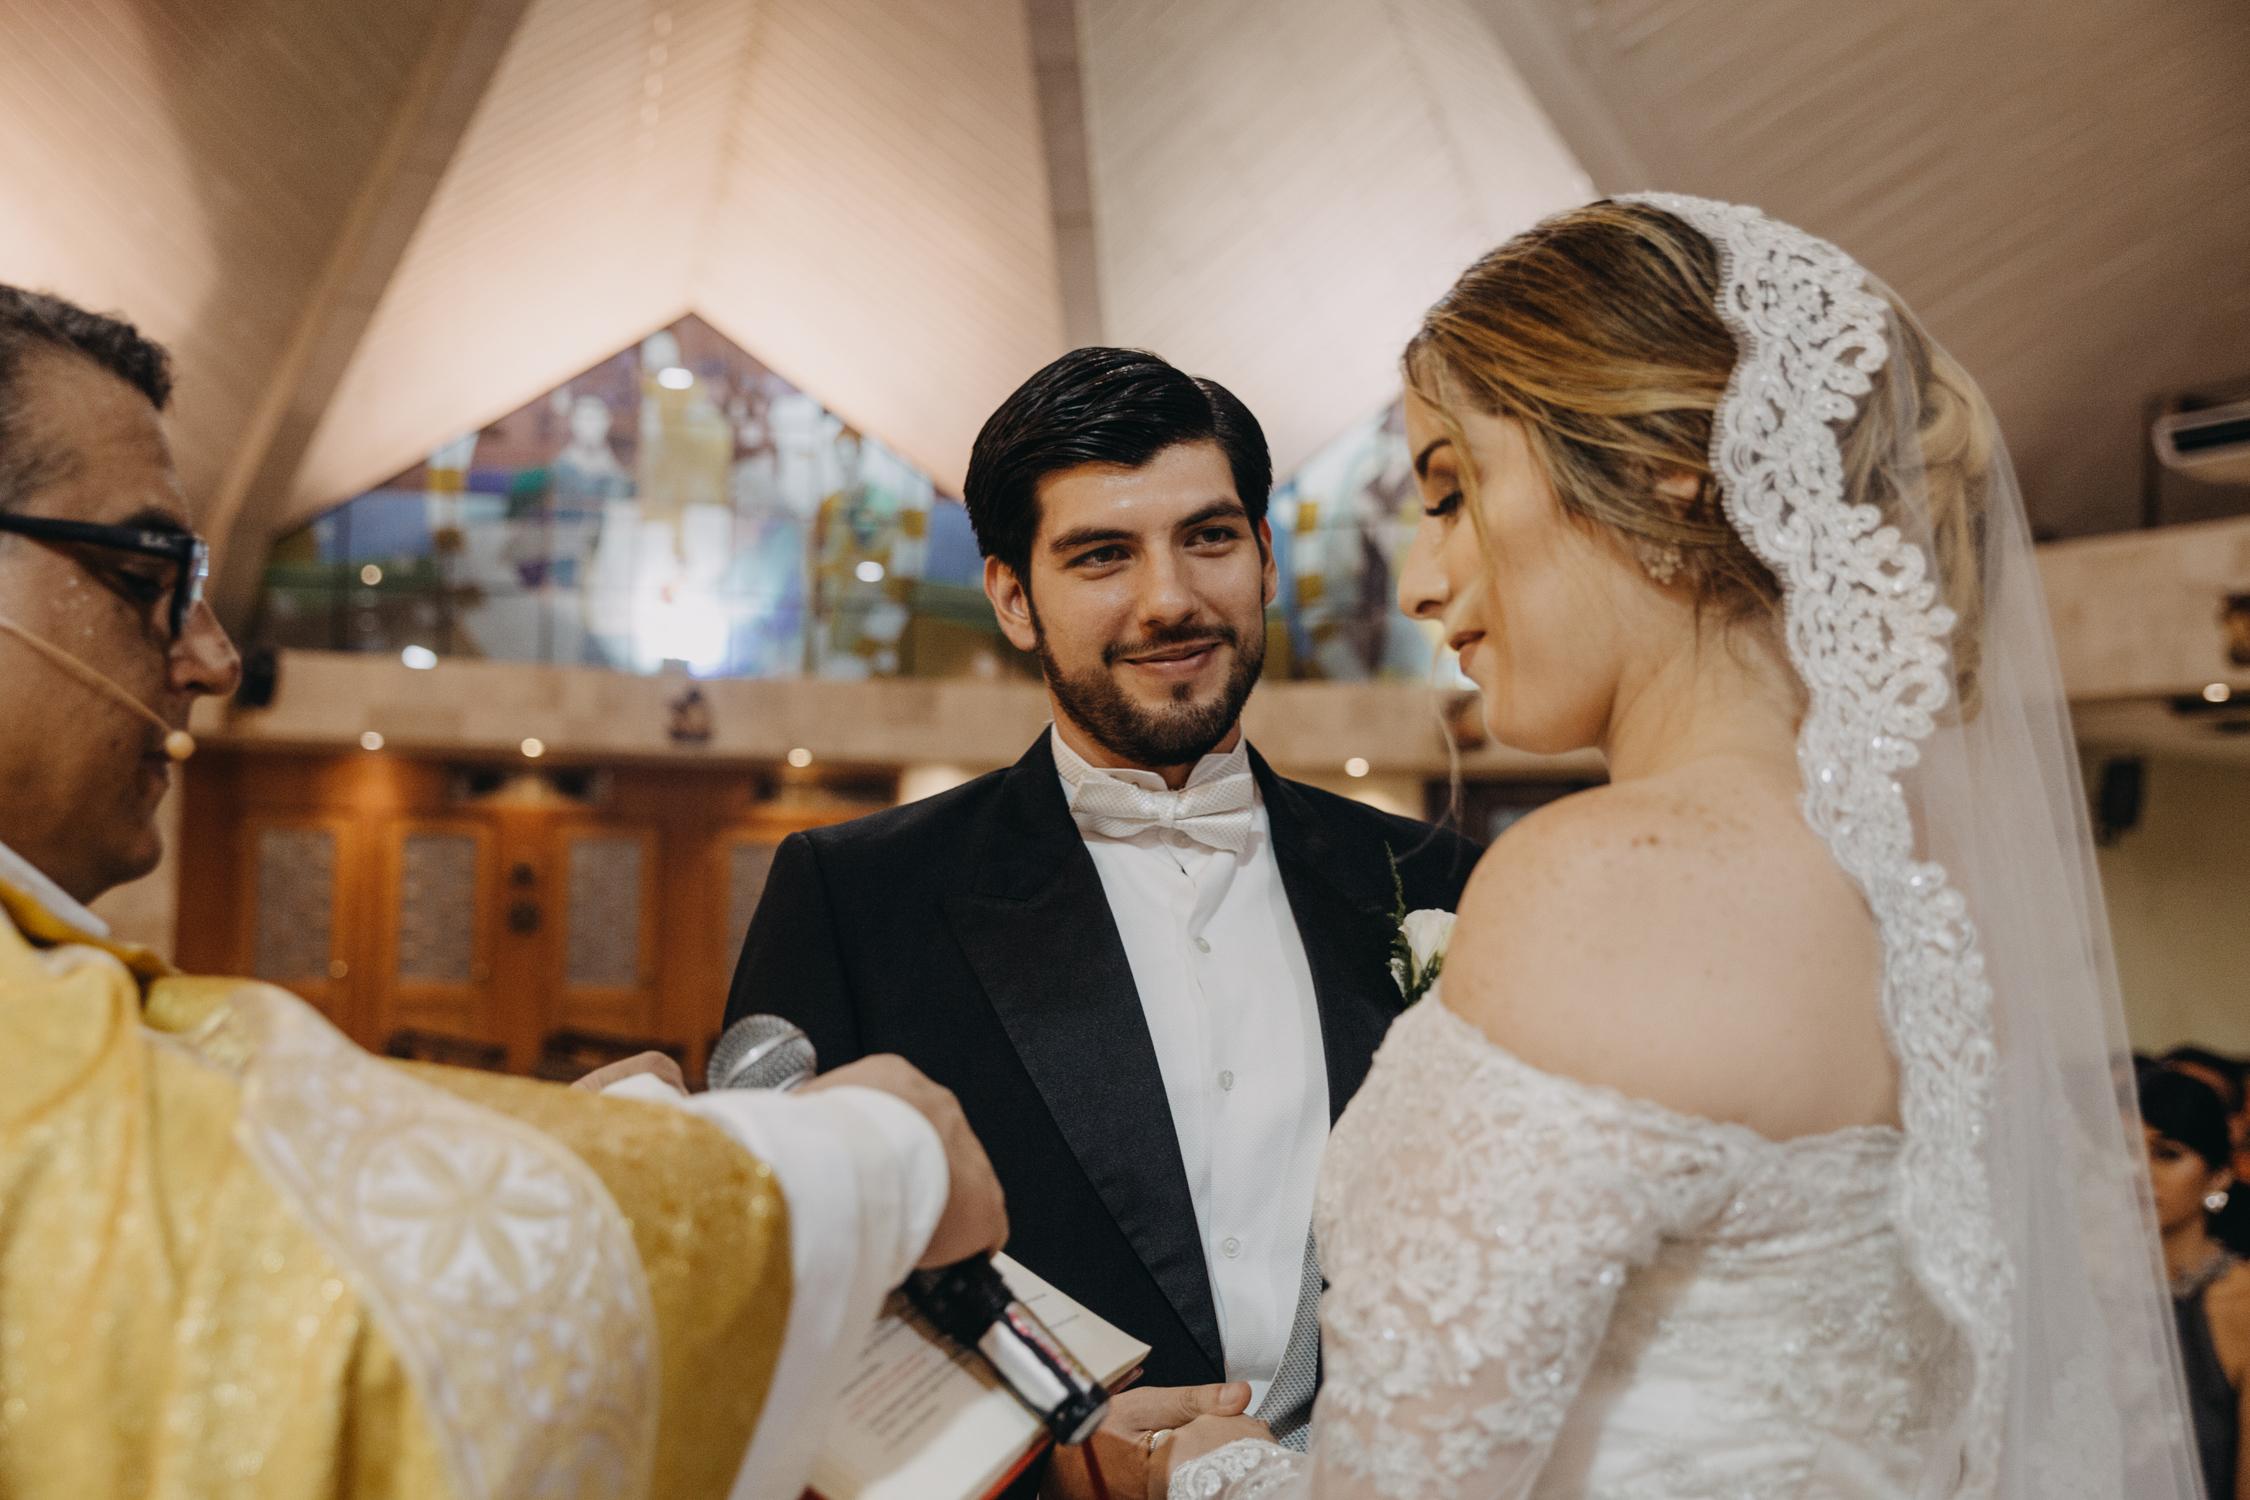 Michelle-Agurto-Fotografia-Bodas-Ecuador-Destination-Wedding-Photographer-Vicky-Javier-73.JPG